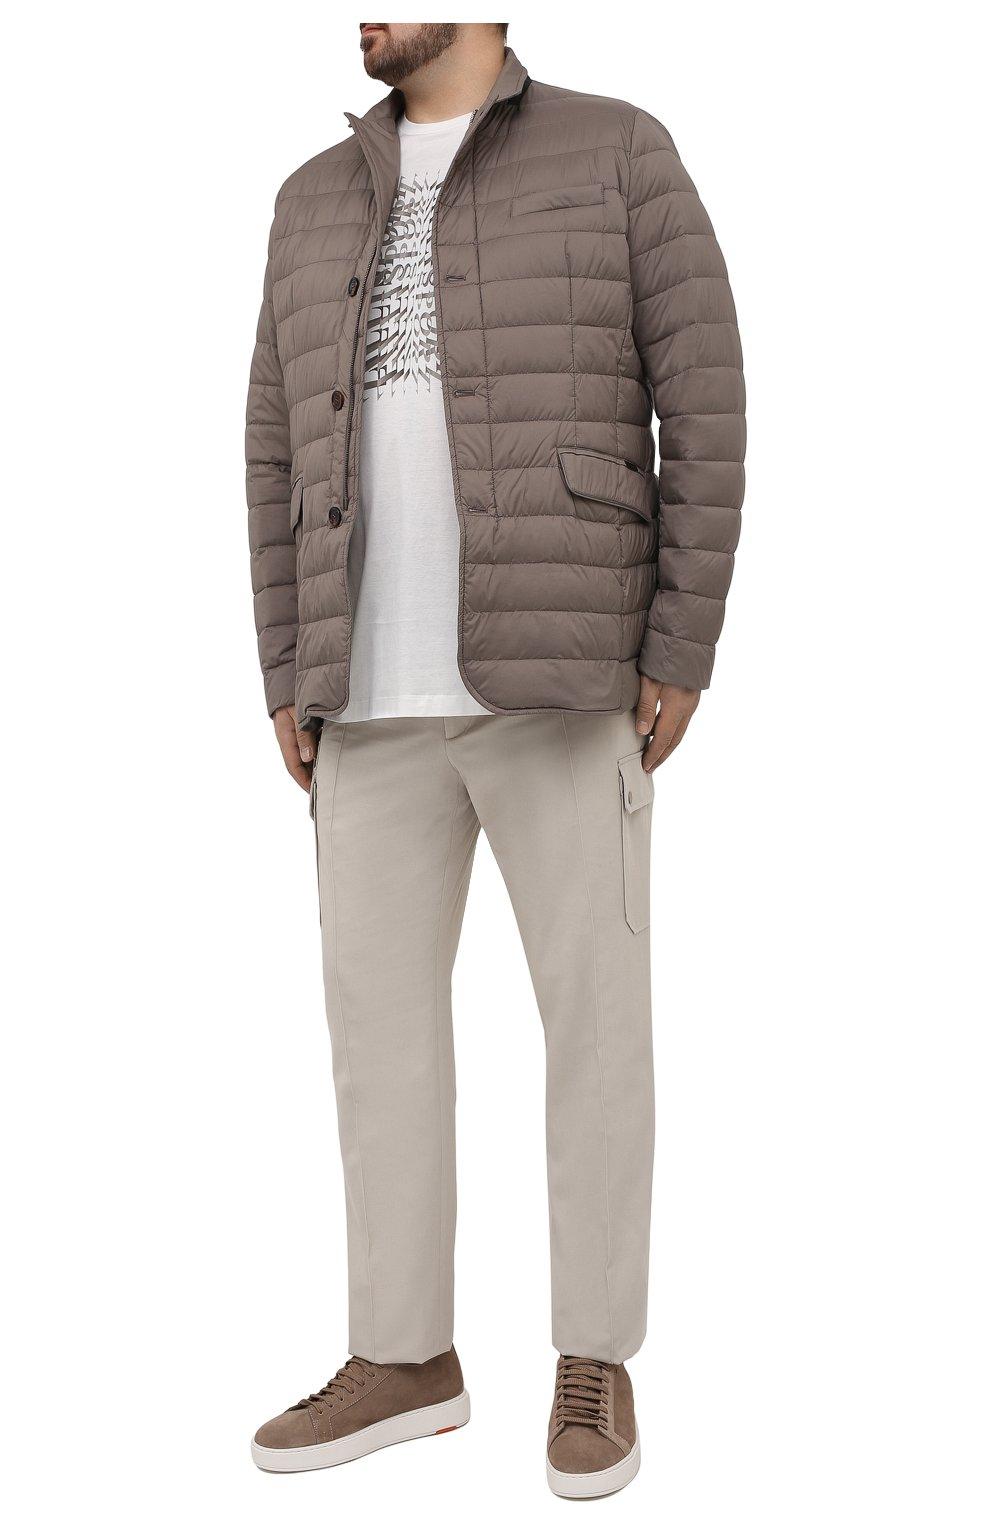 Мужская пуховая куртка zavyer-s3 MOORER бежевого цвета, арт. ZAVYER-S3/M0UGI100071-TEPA028/60-68   Фото 2